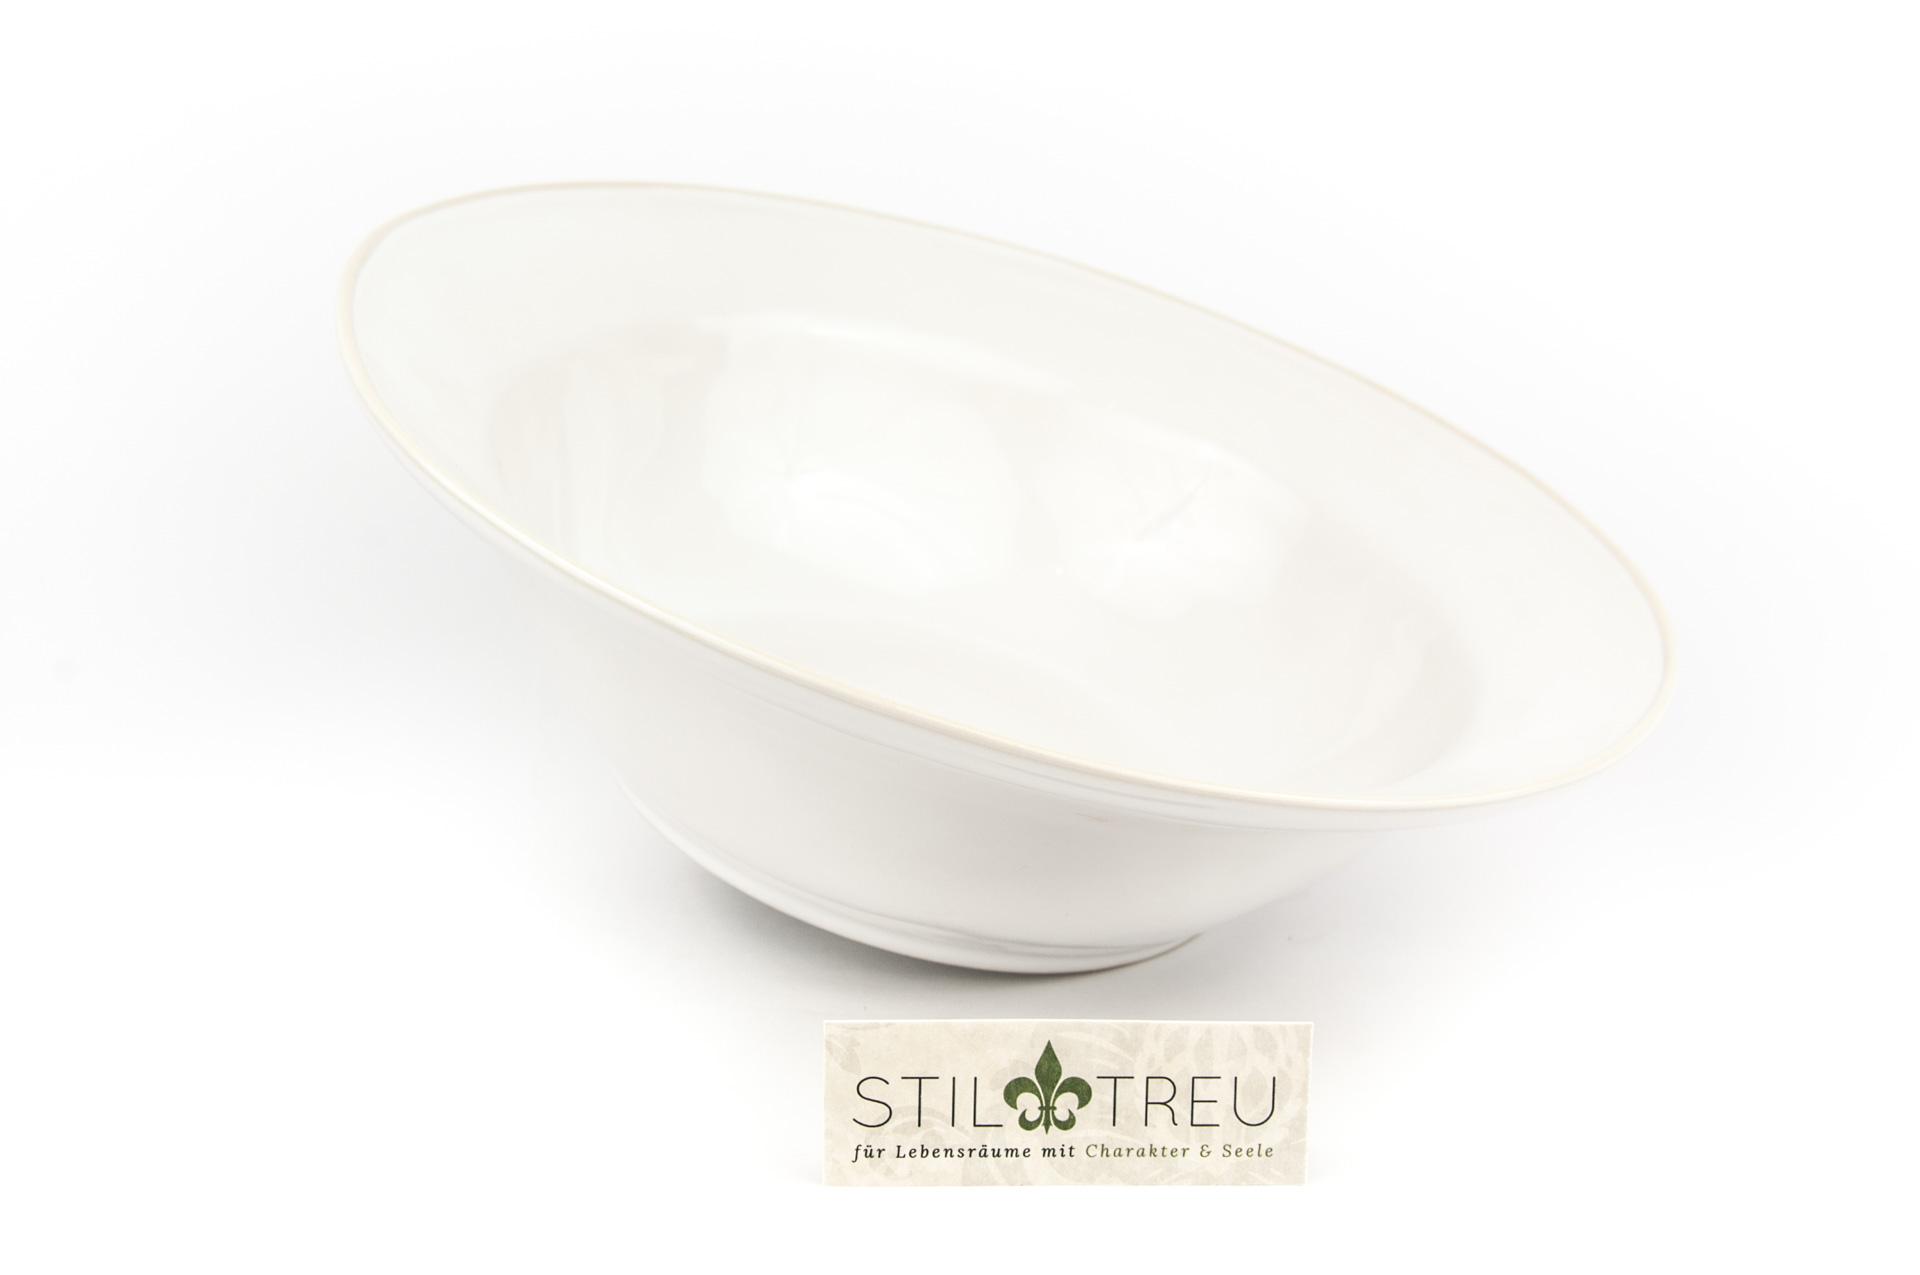 Salatschüssel Astoria, weiß, 30 cm